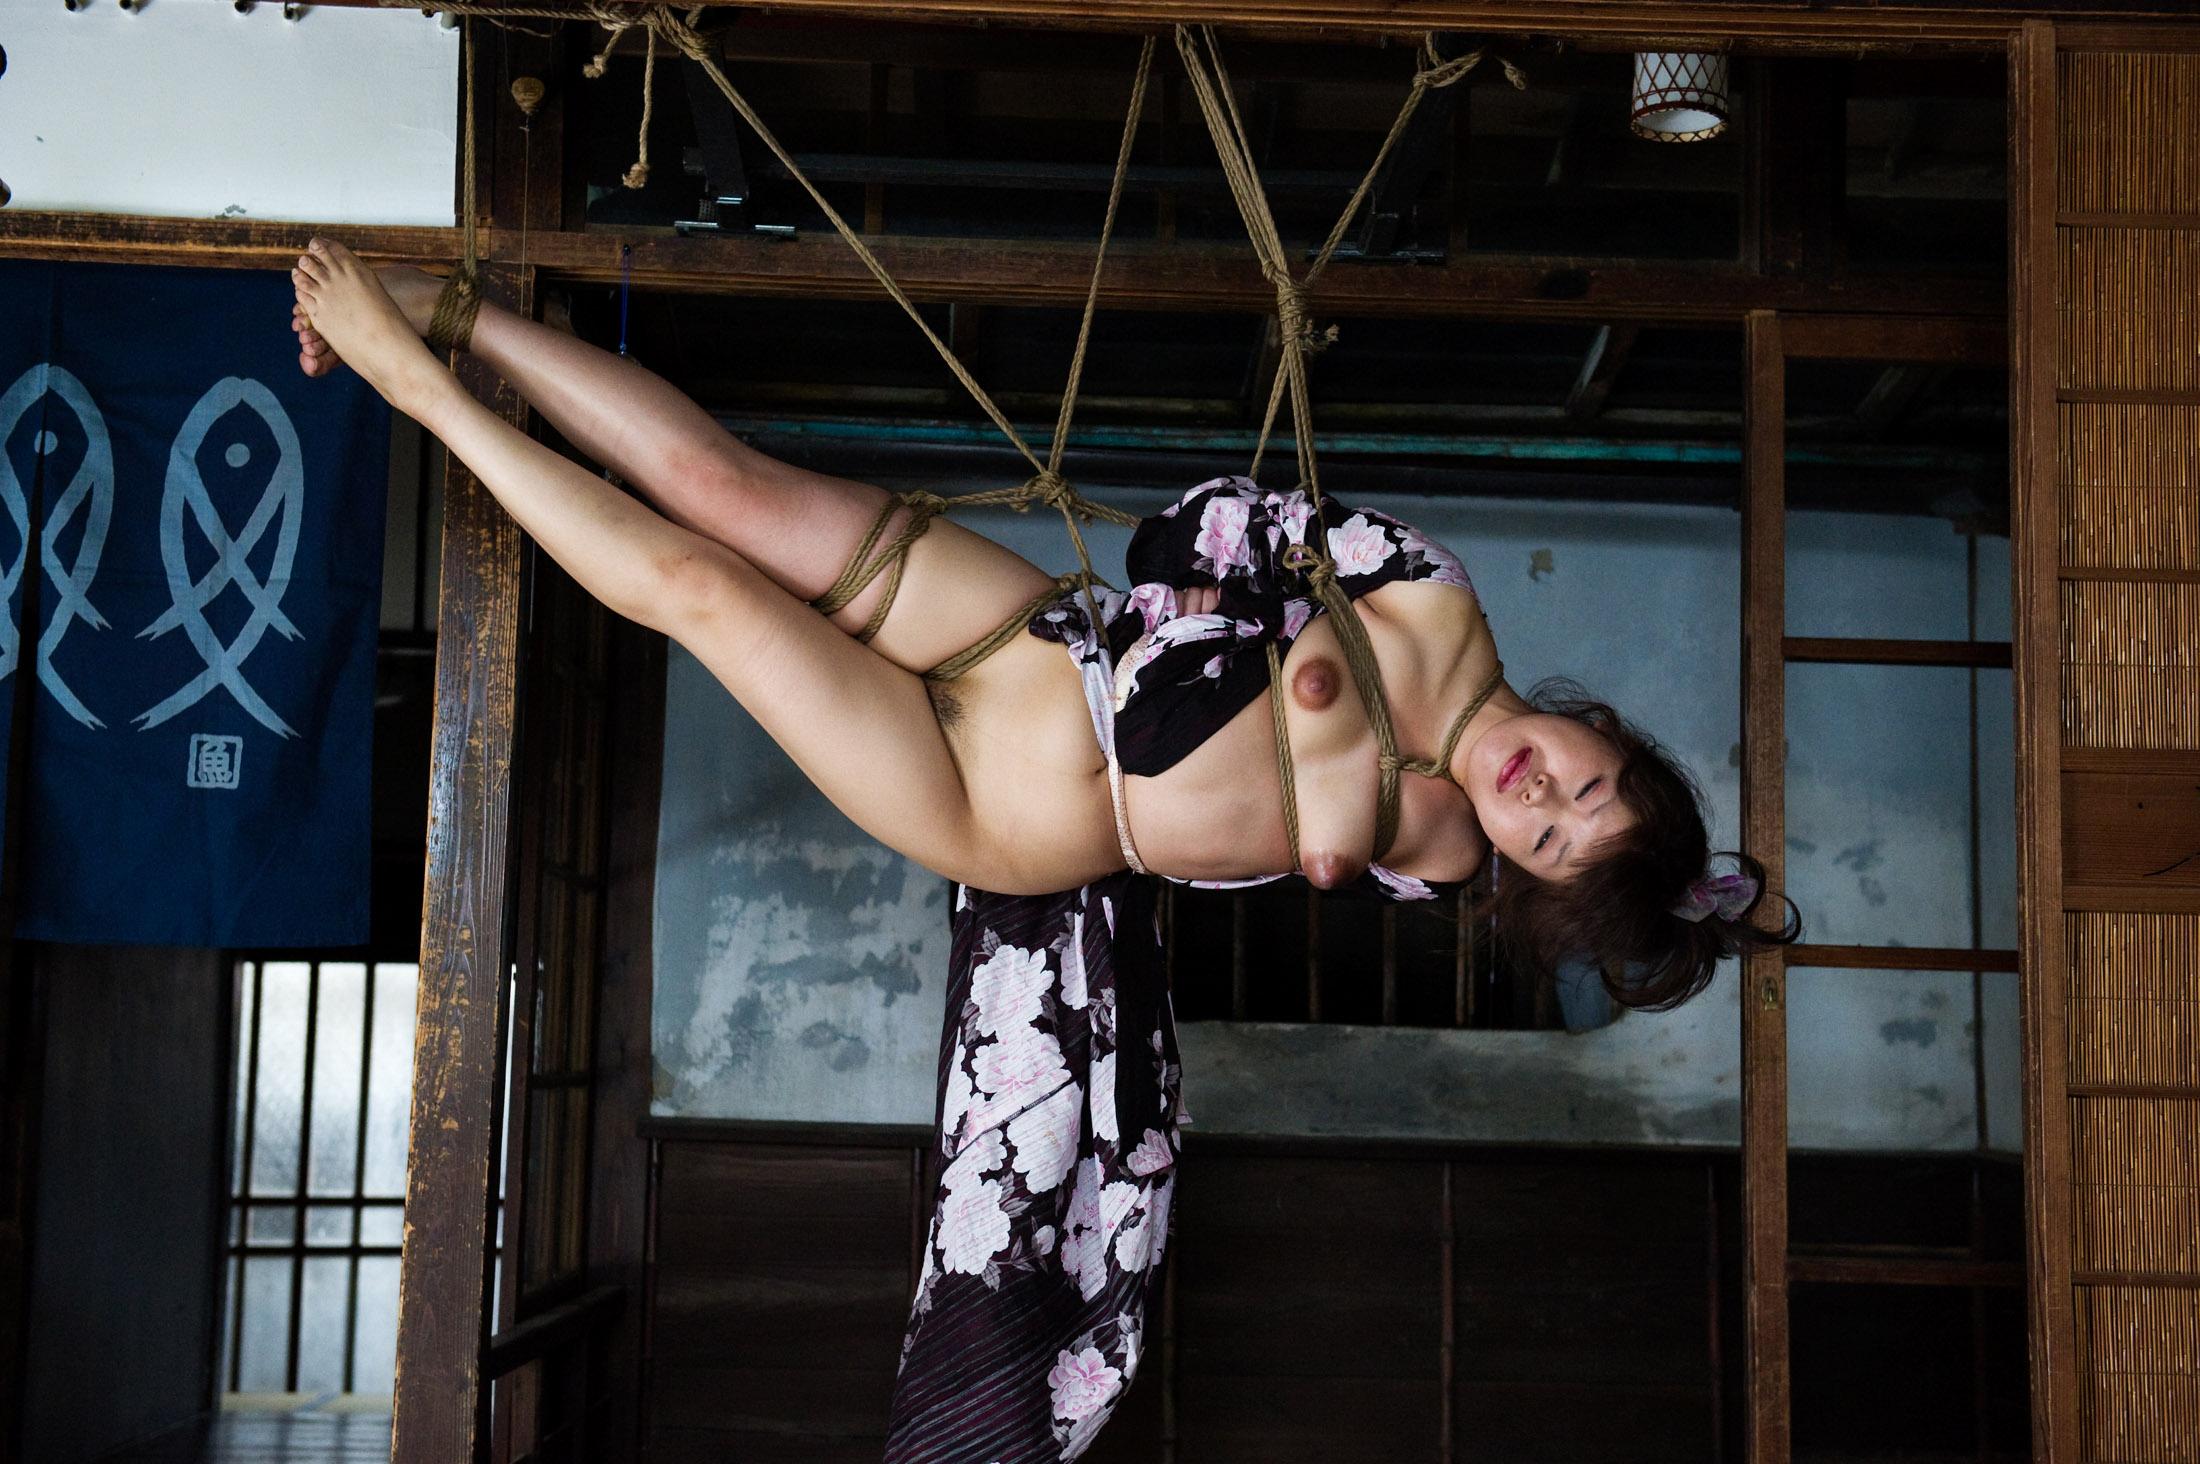 Fka twigs pendulum by fka twigs